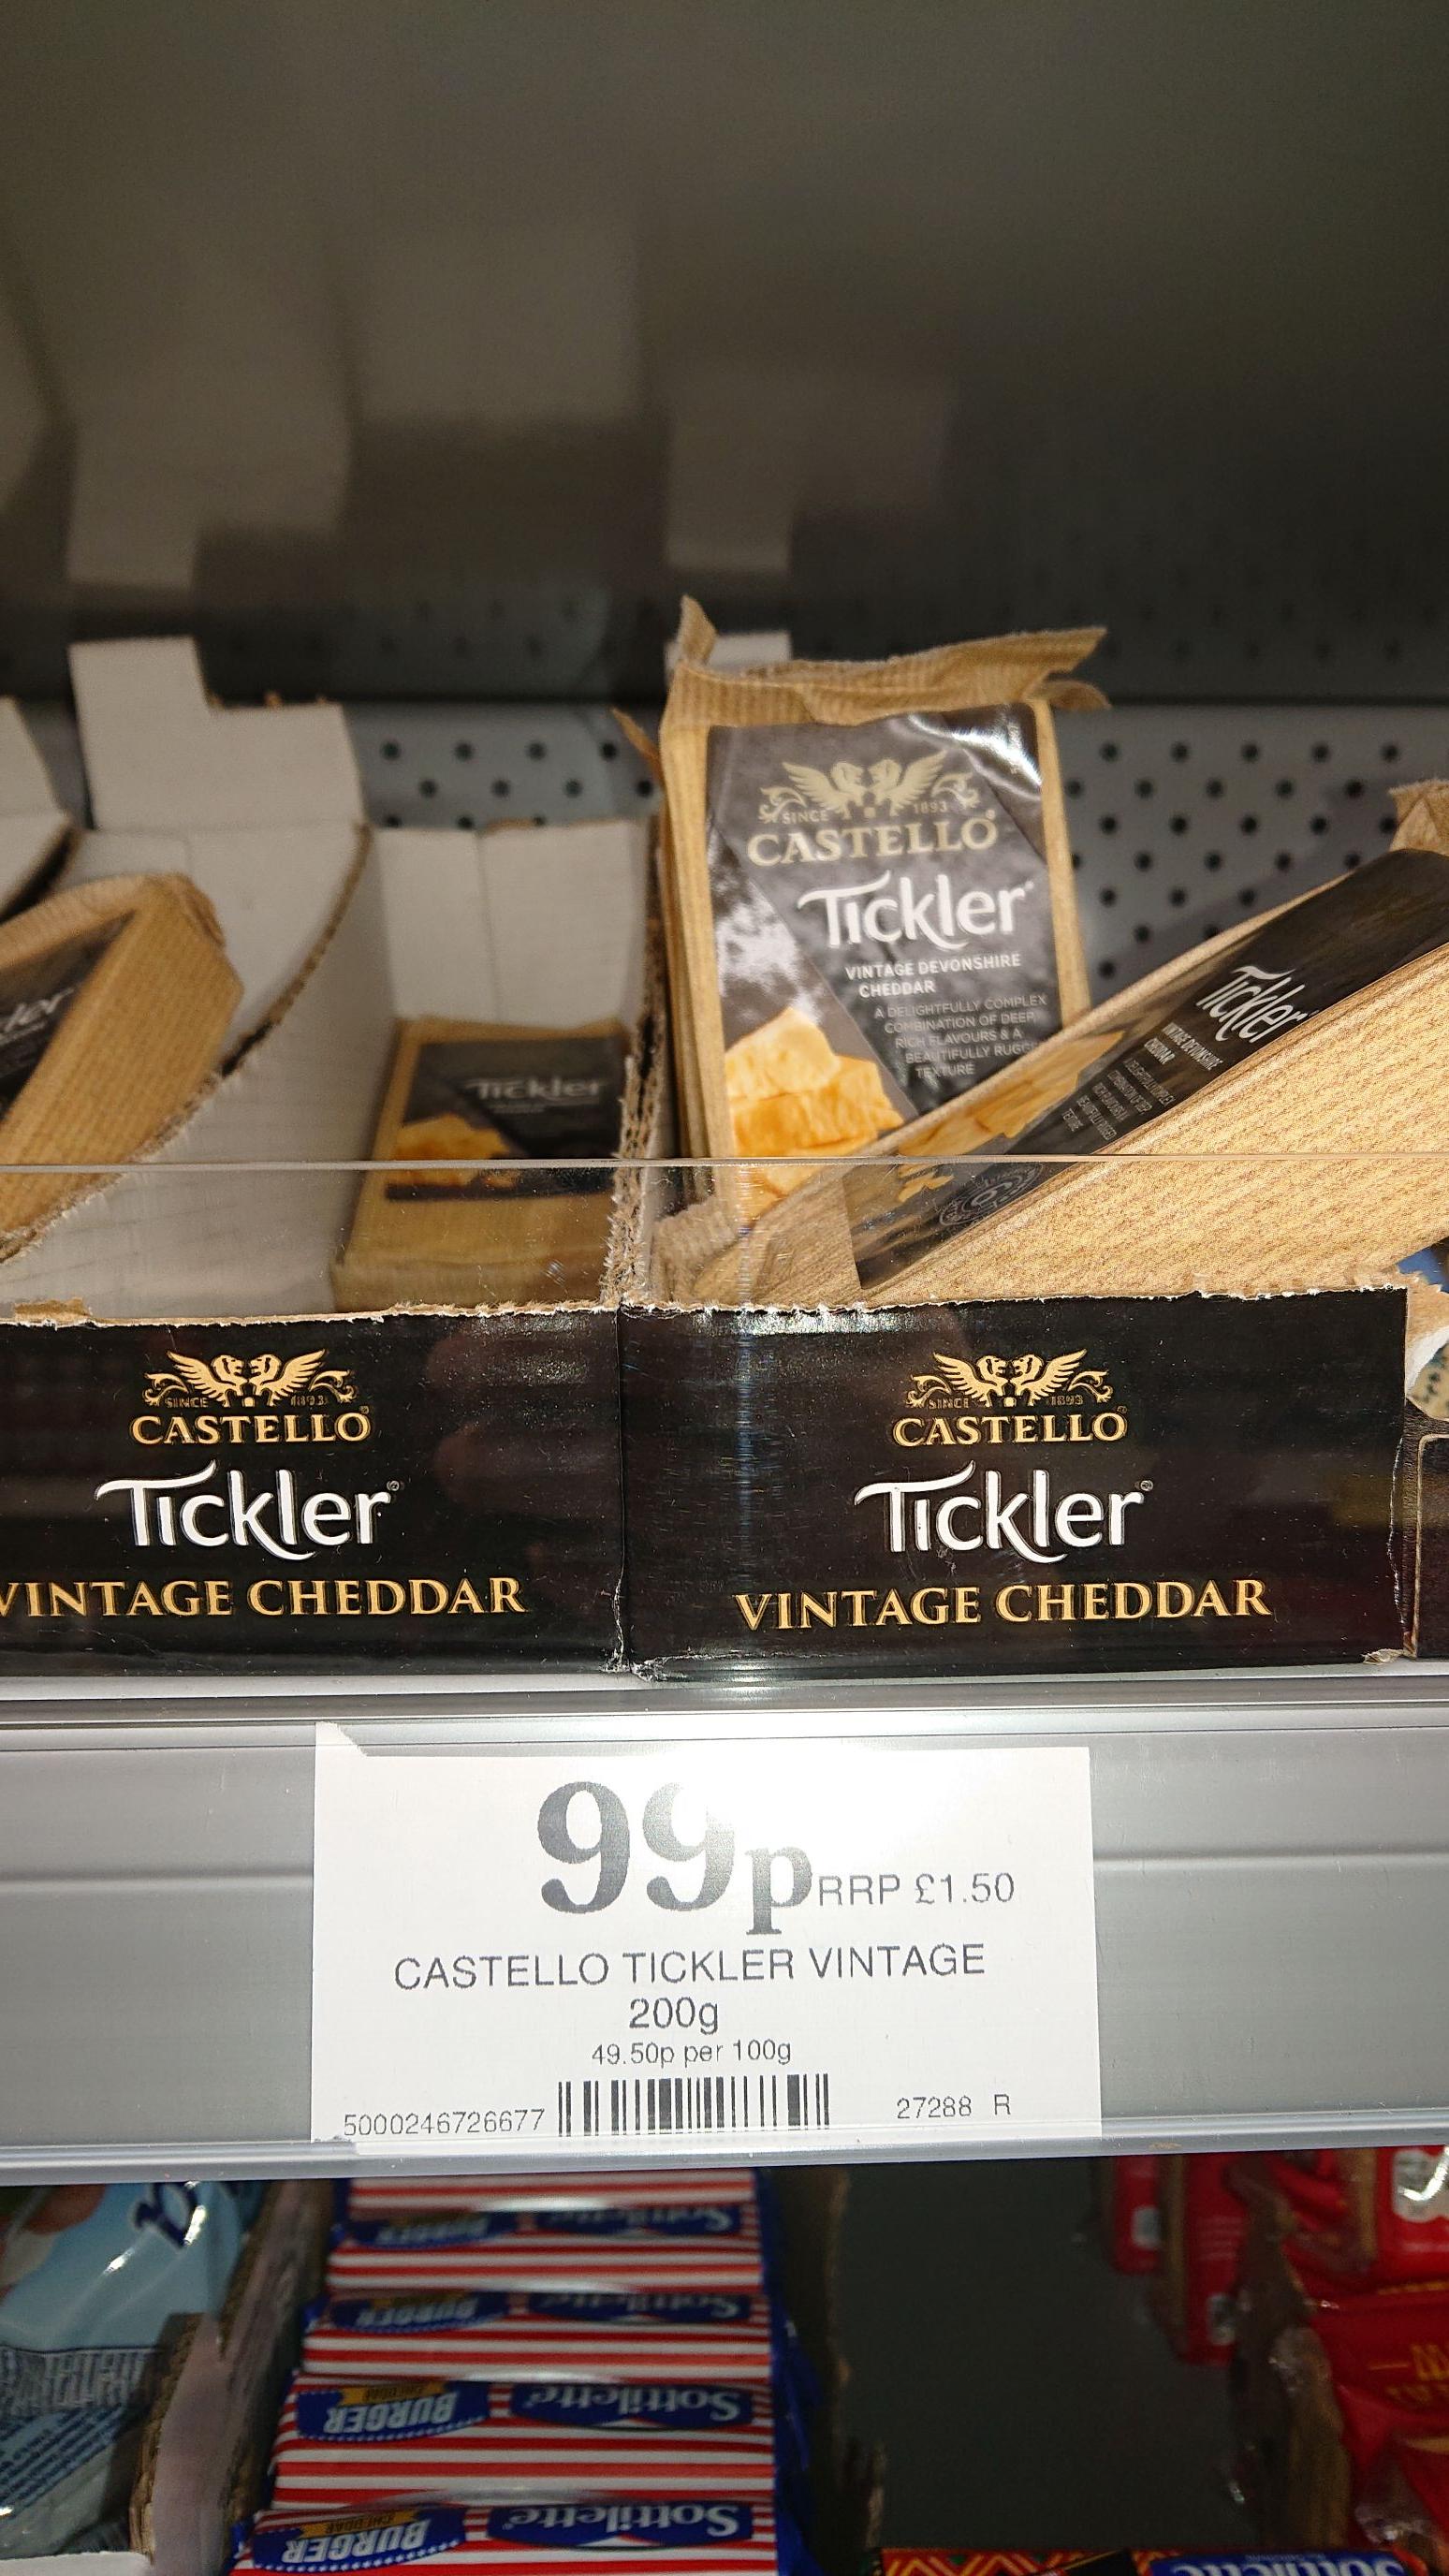 Castello Tickler (Extra Mature/5, and Vintage/6) 200g 99p @ Home Bargains (Cheltenham)